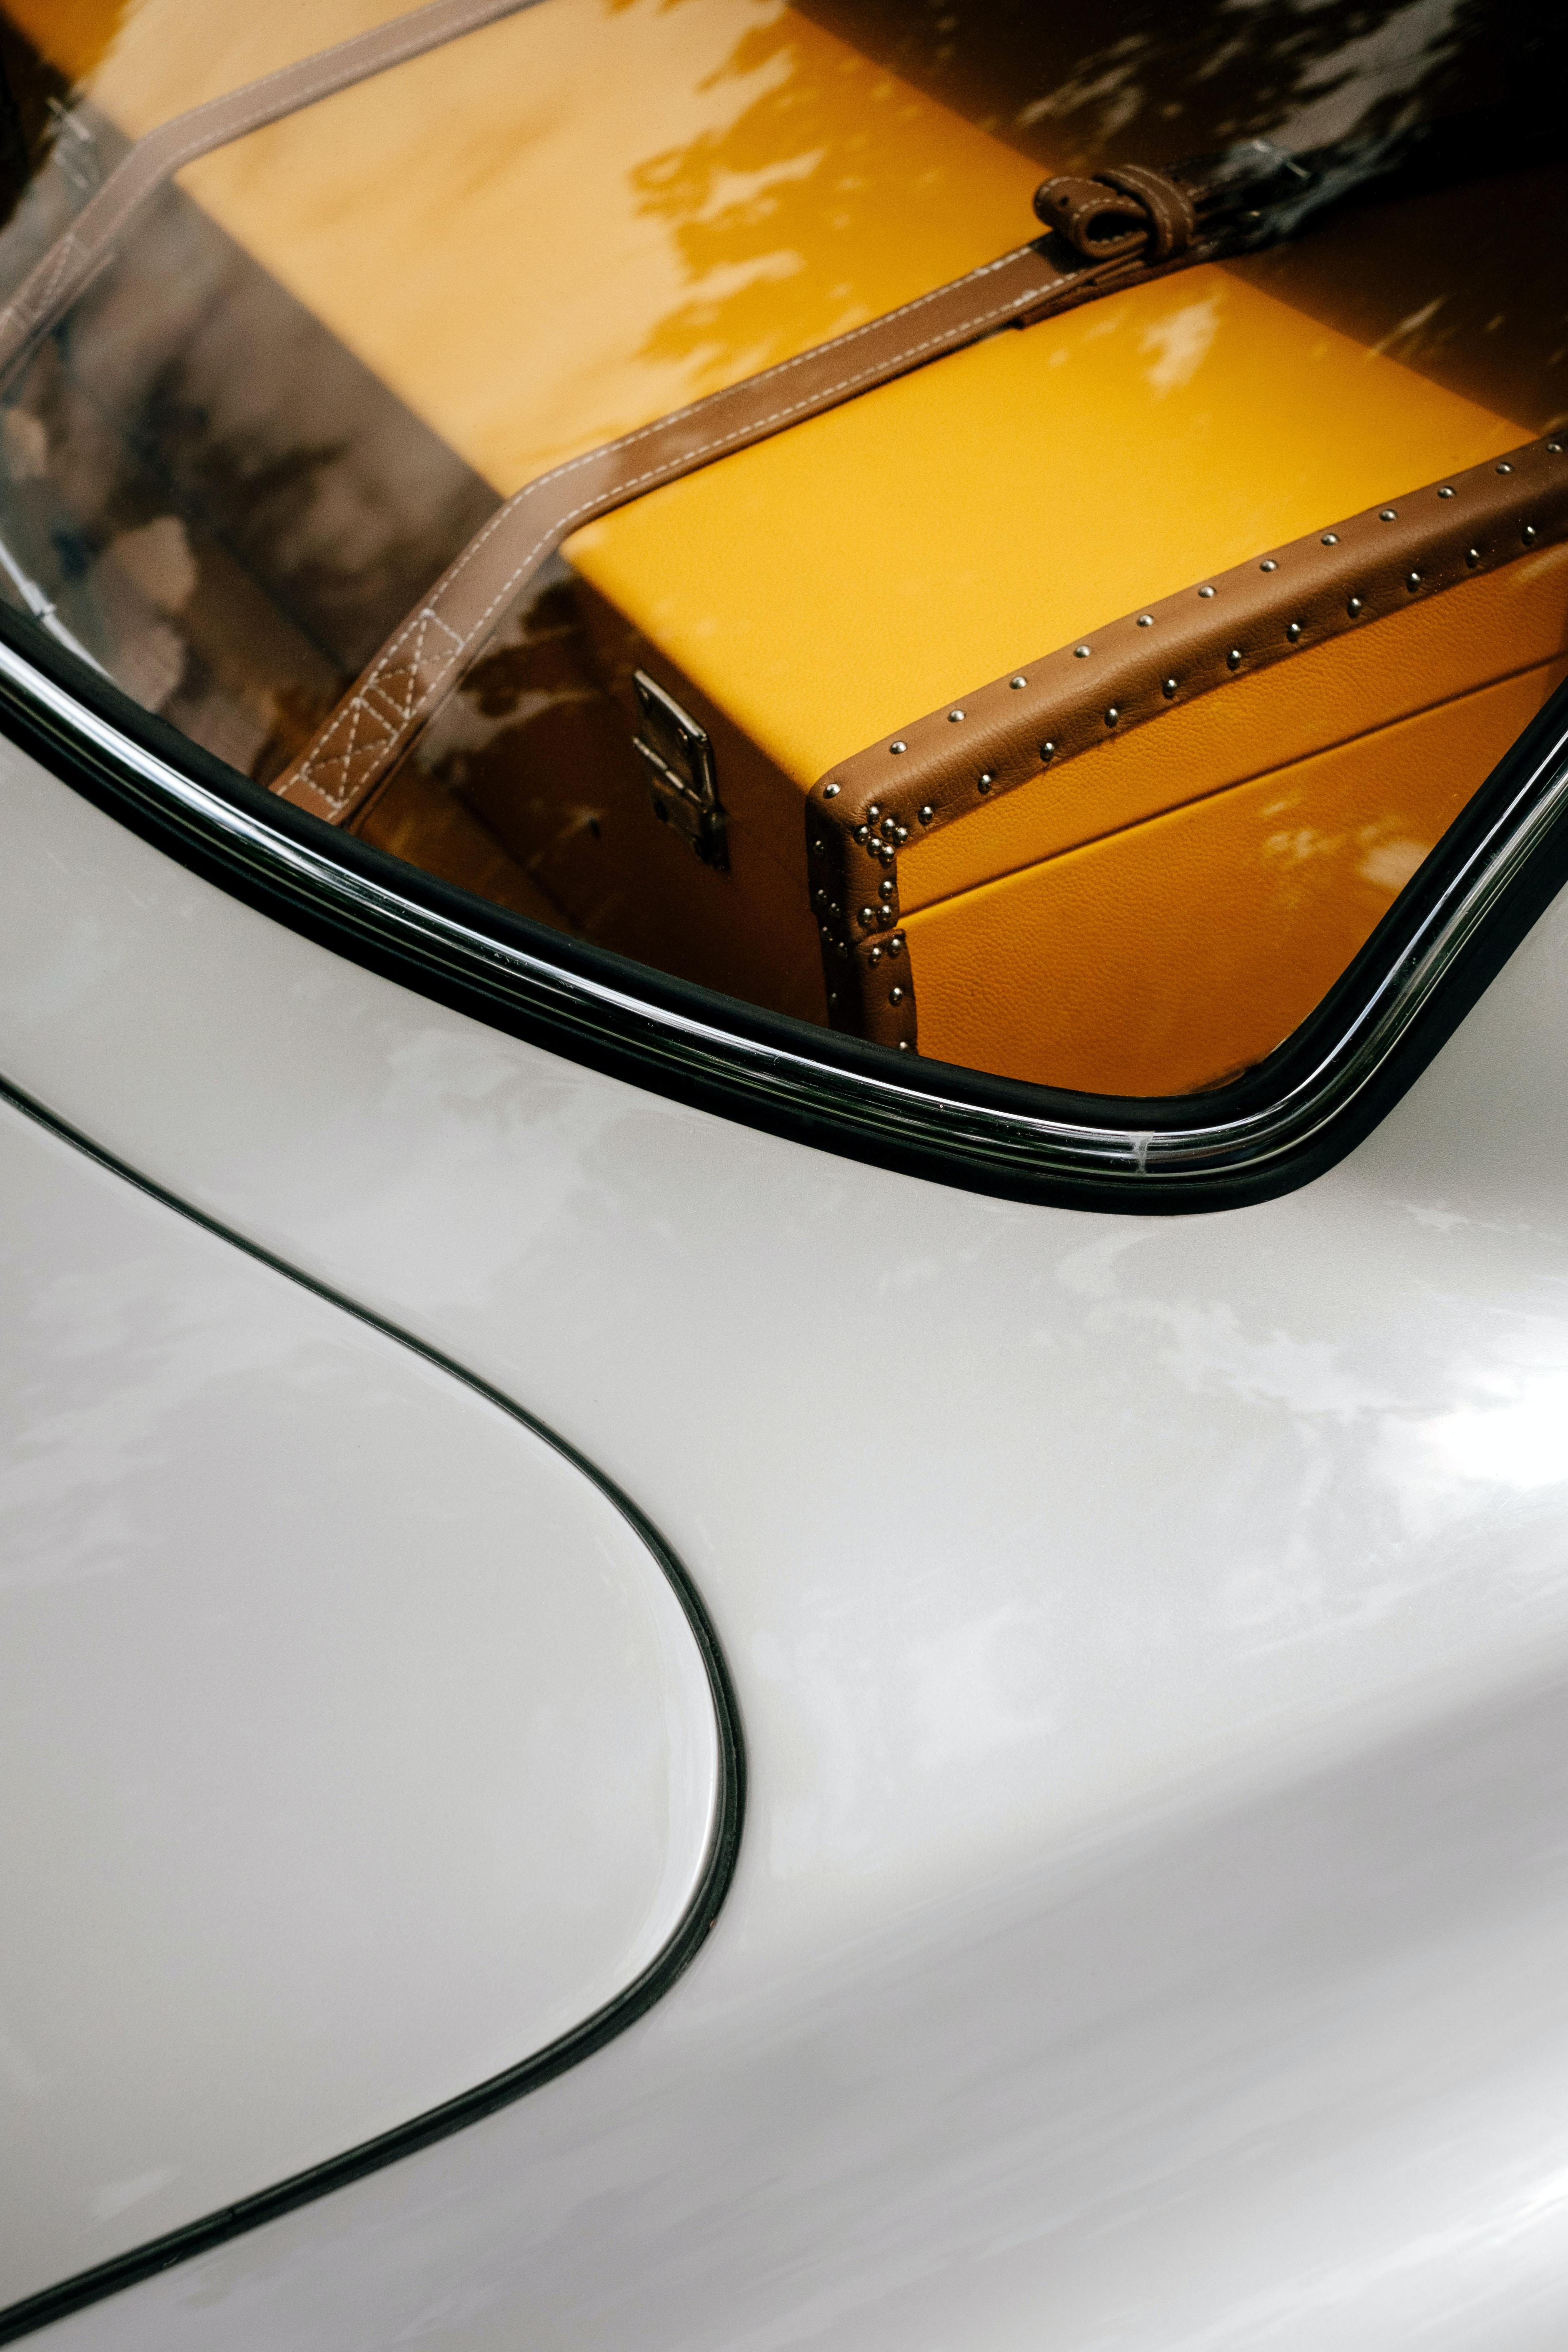 brown chest box inside silver car